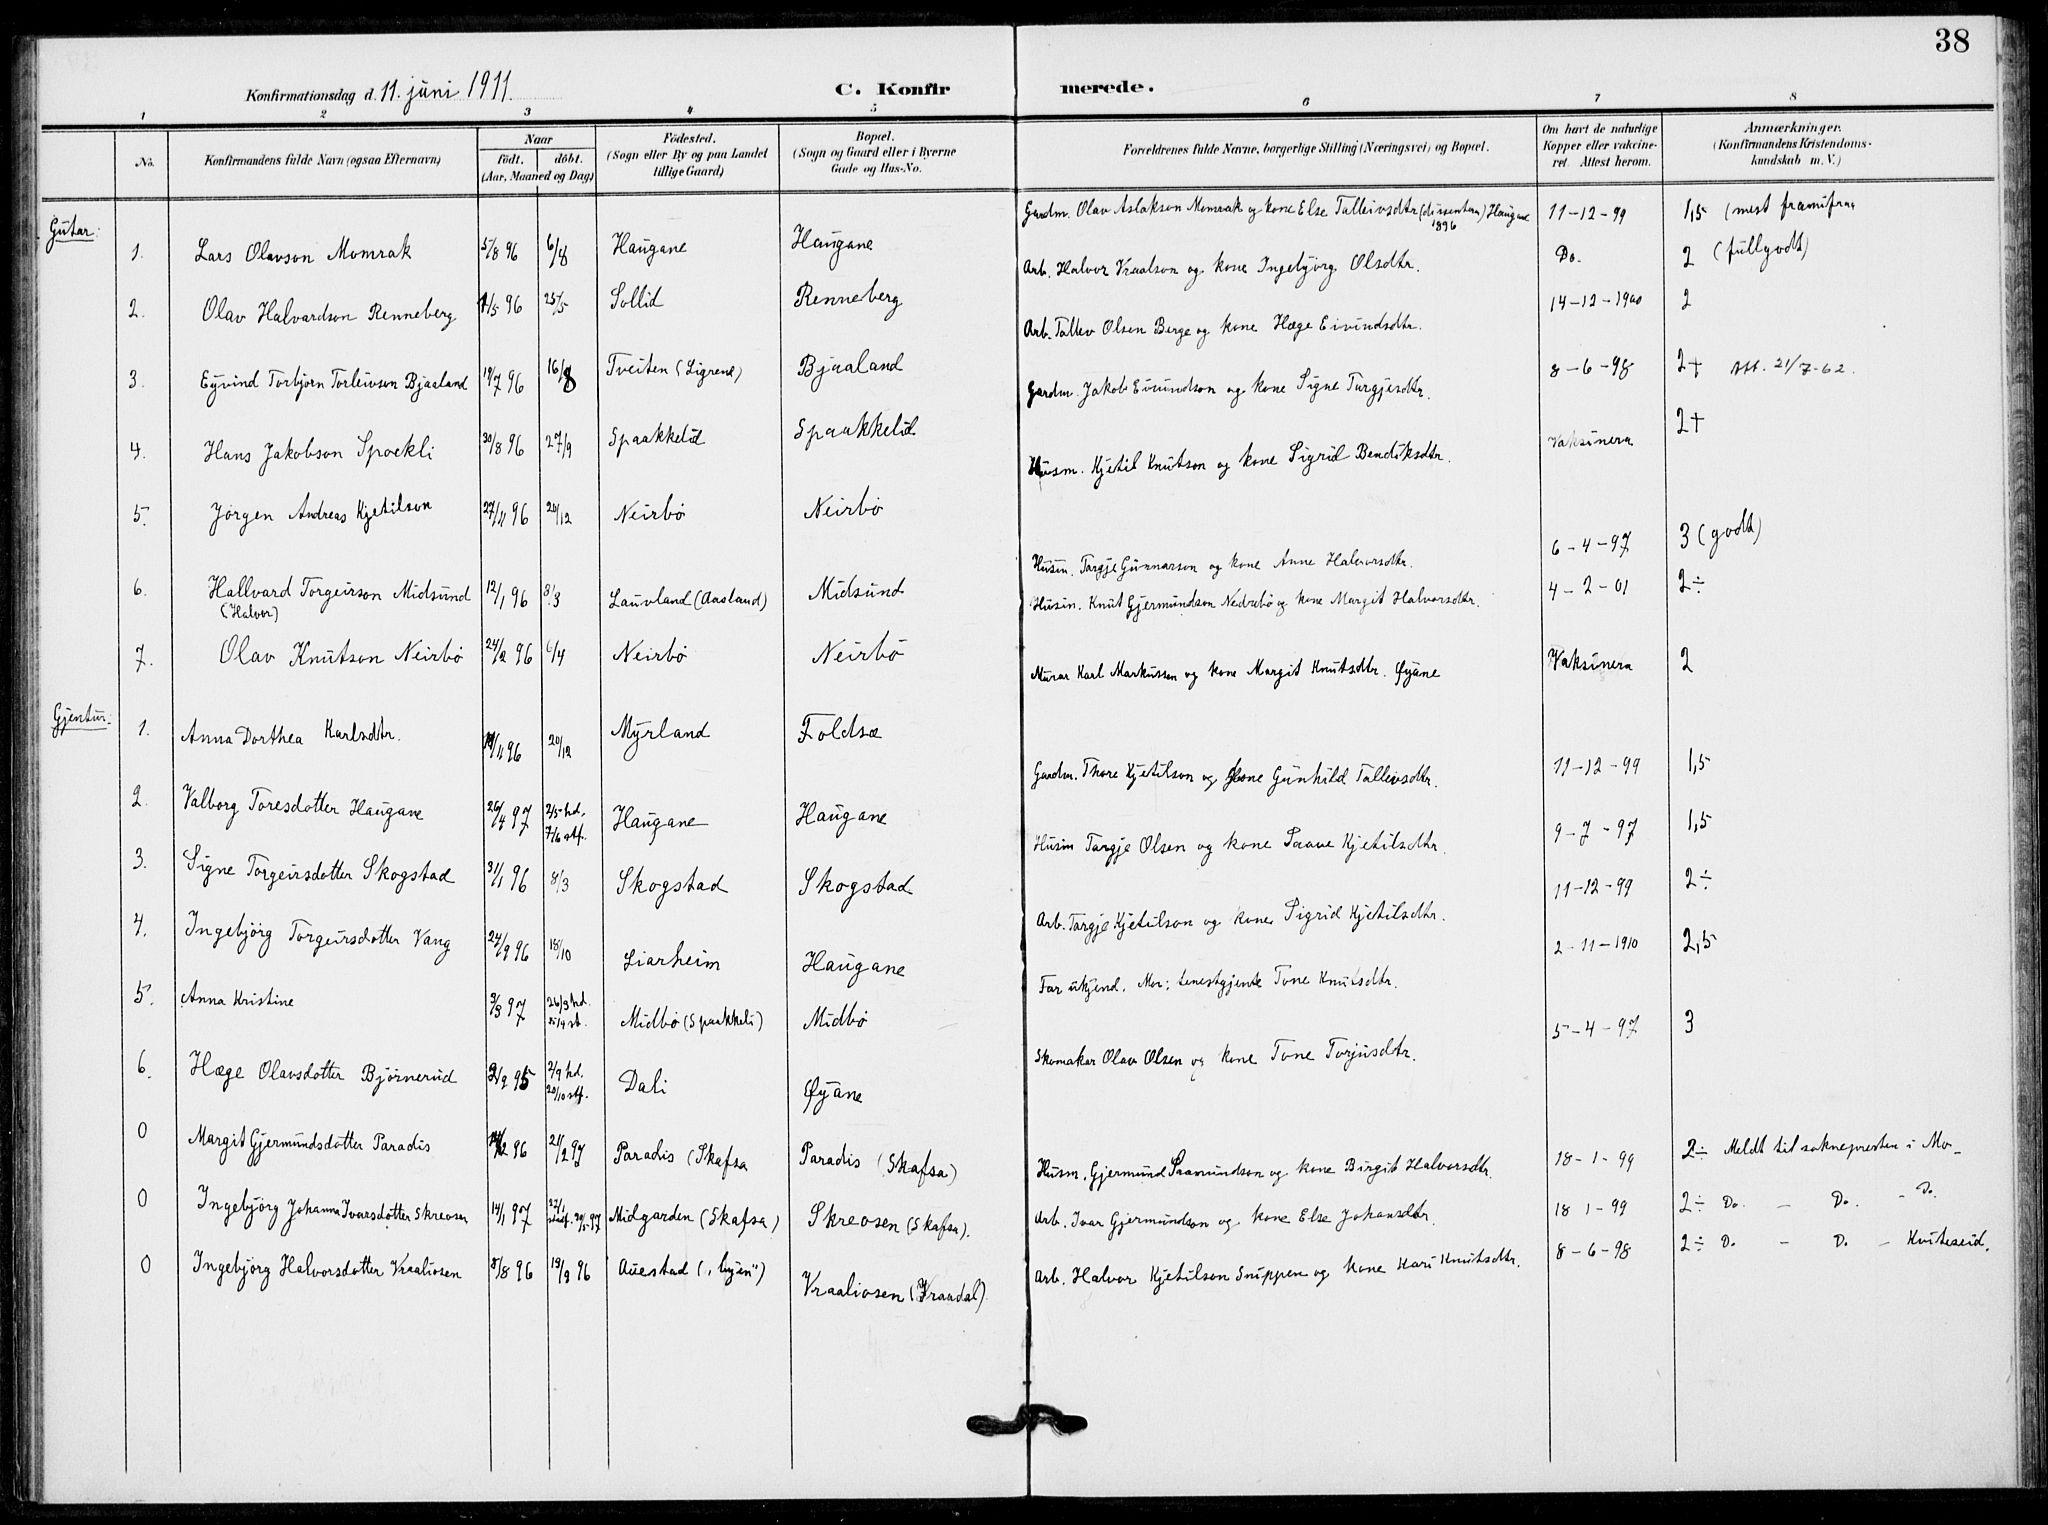 SAKO, Fyresdal kirkebøker, F/Fb/L0004: Ministerialbok nr. II 4, 1903-1920, s. 38